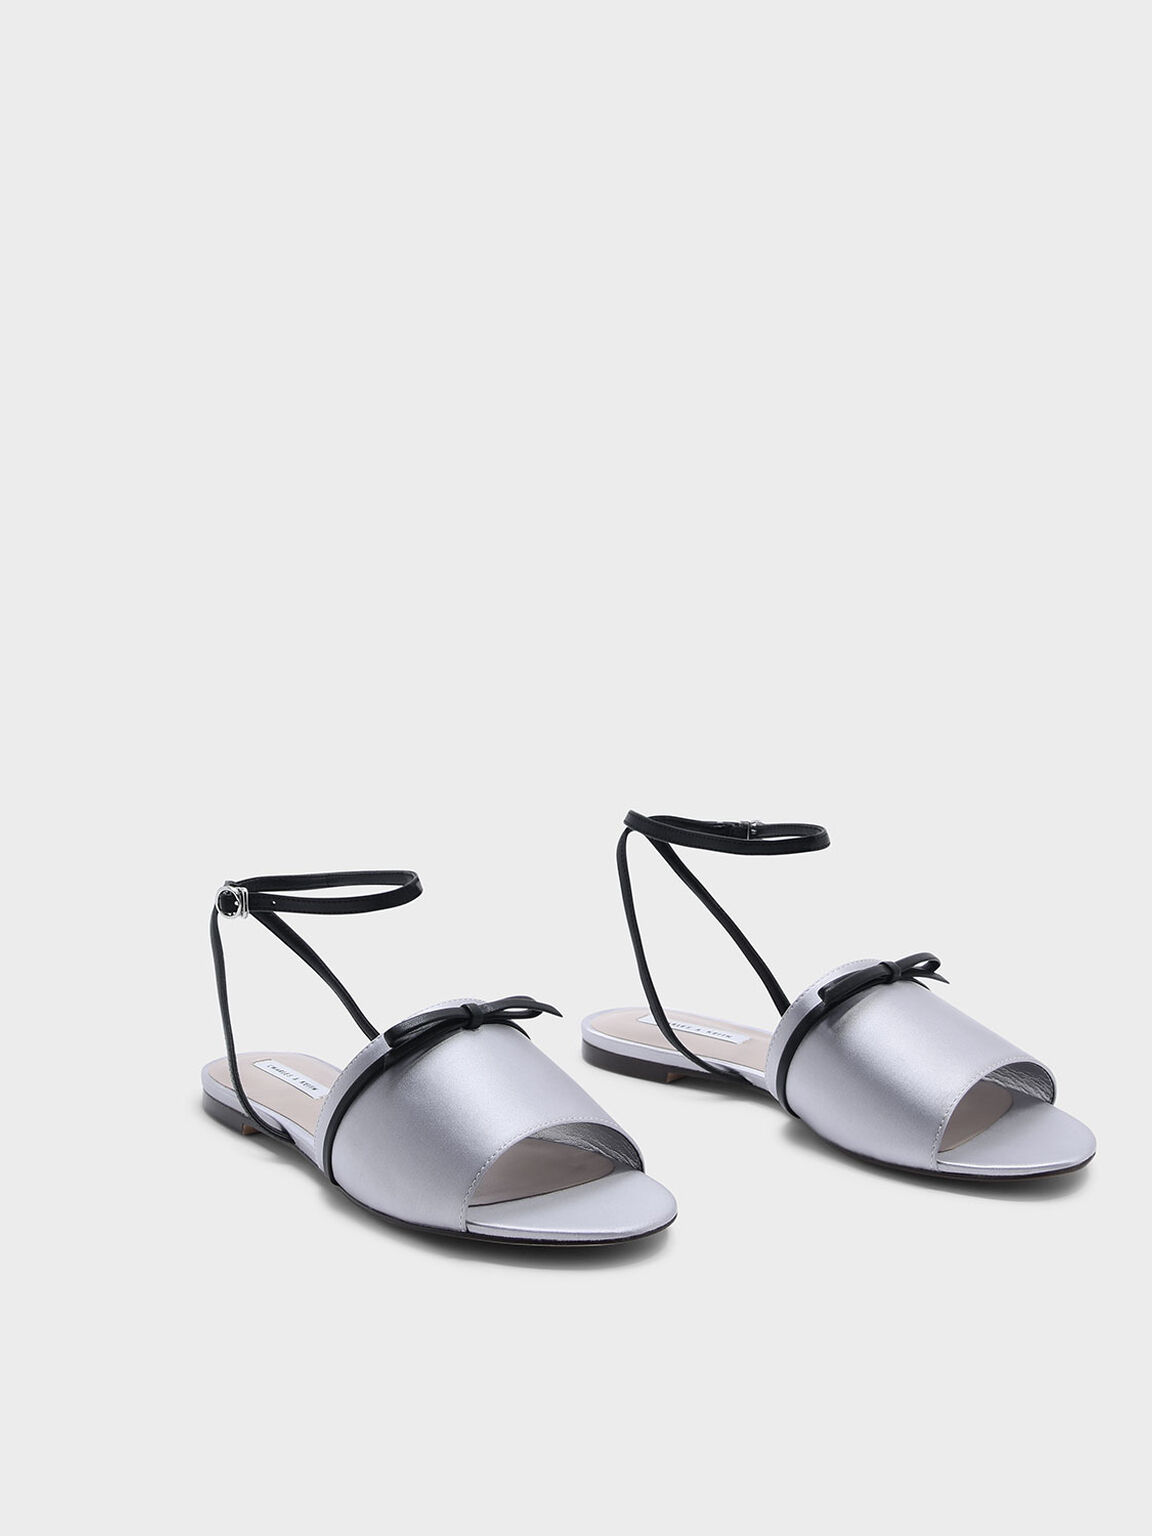 Bow Detail Sandals, Grey, hi-res